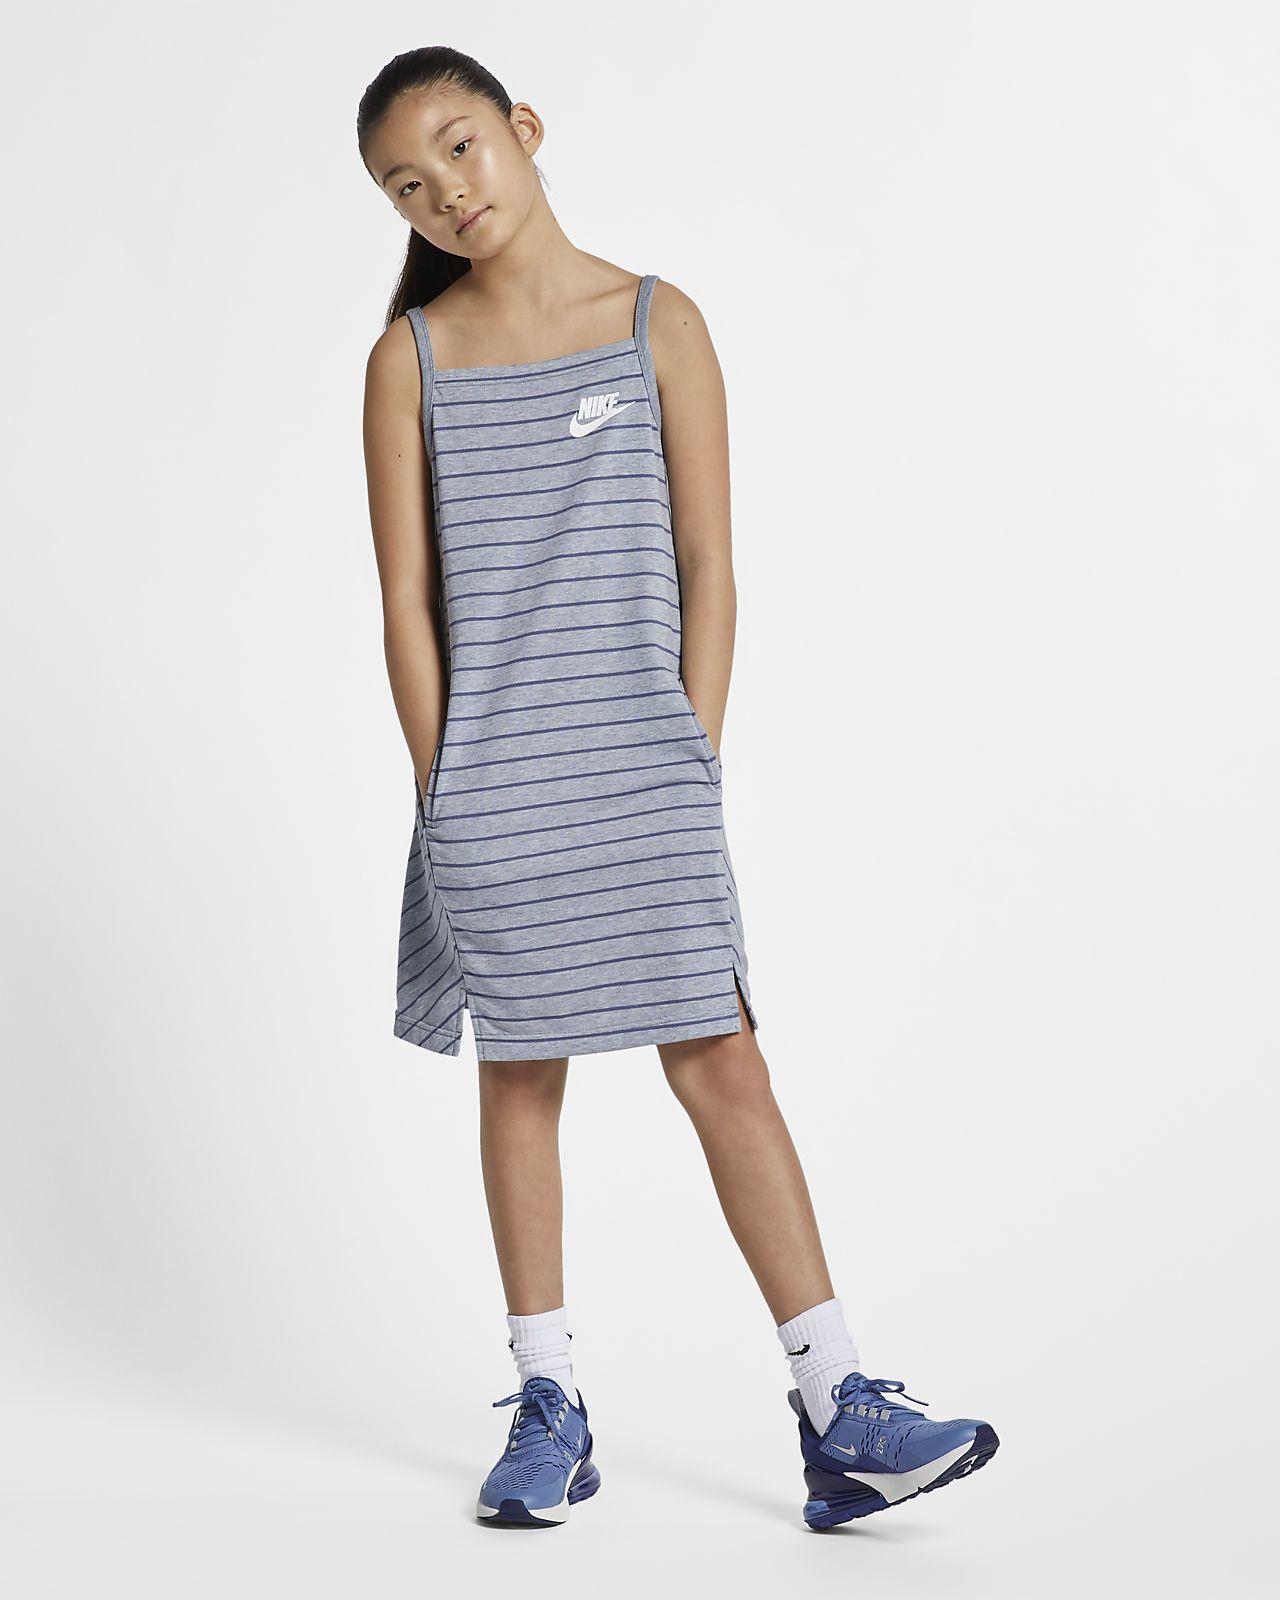 Abito Nike Sportswear - Ragazza